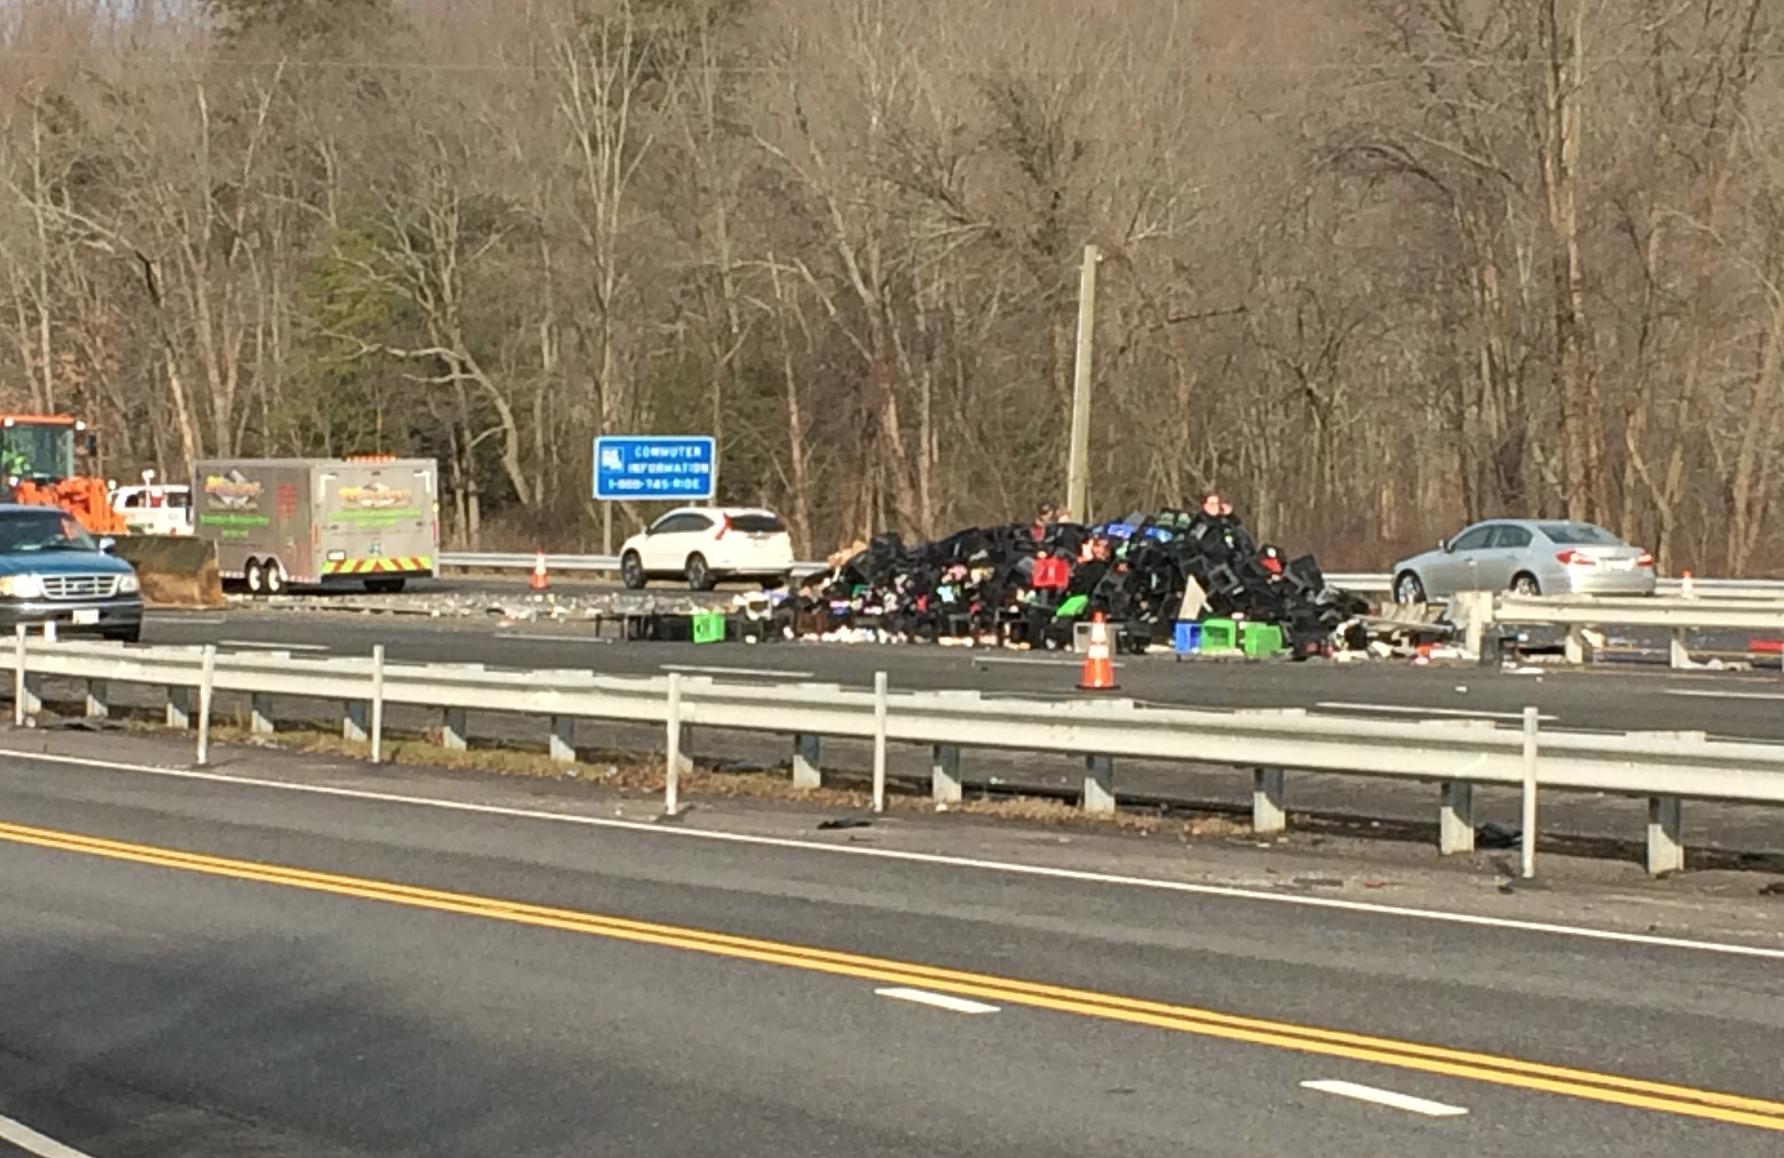 Man dies in Route 50 crash near Chesapeake Bay Bridge